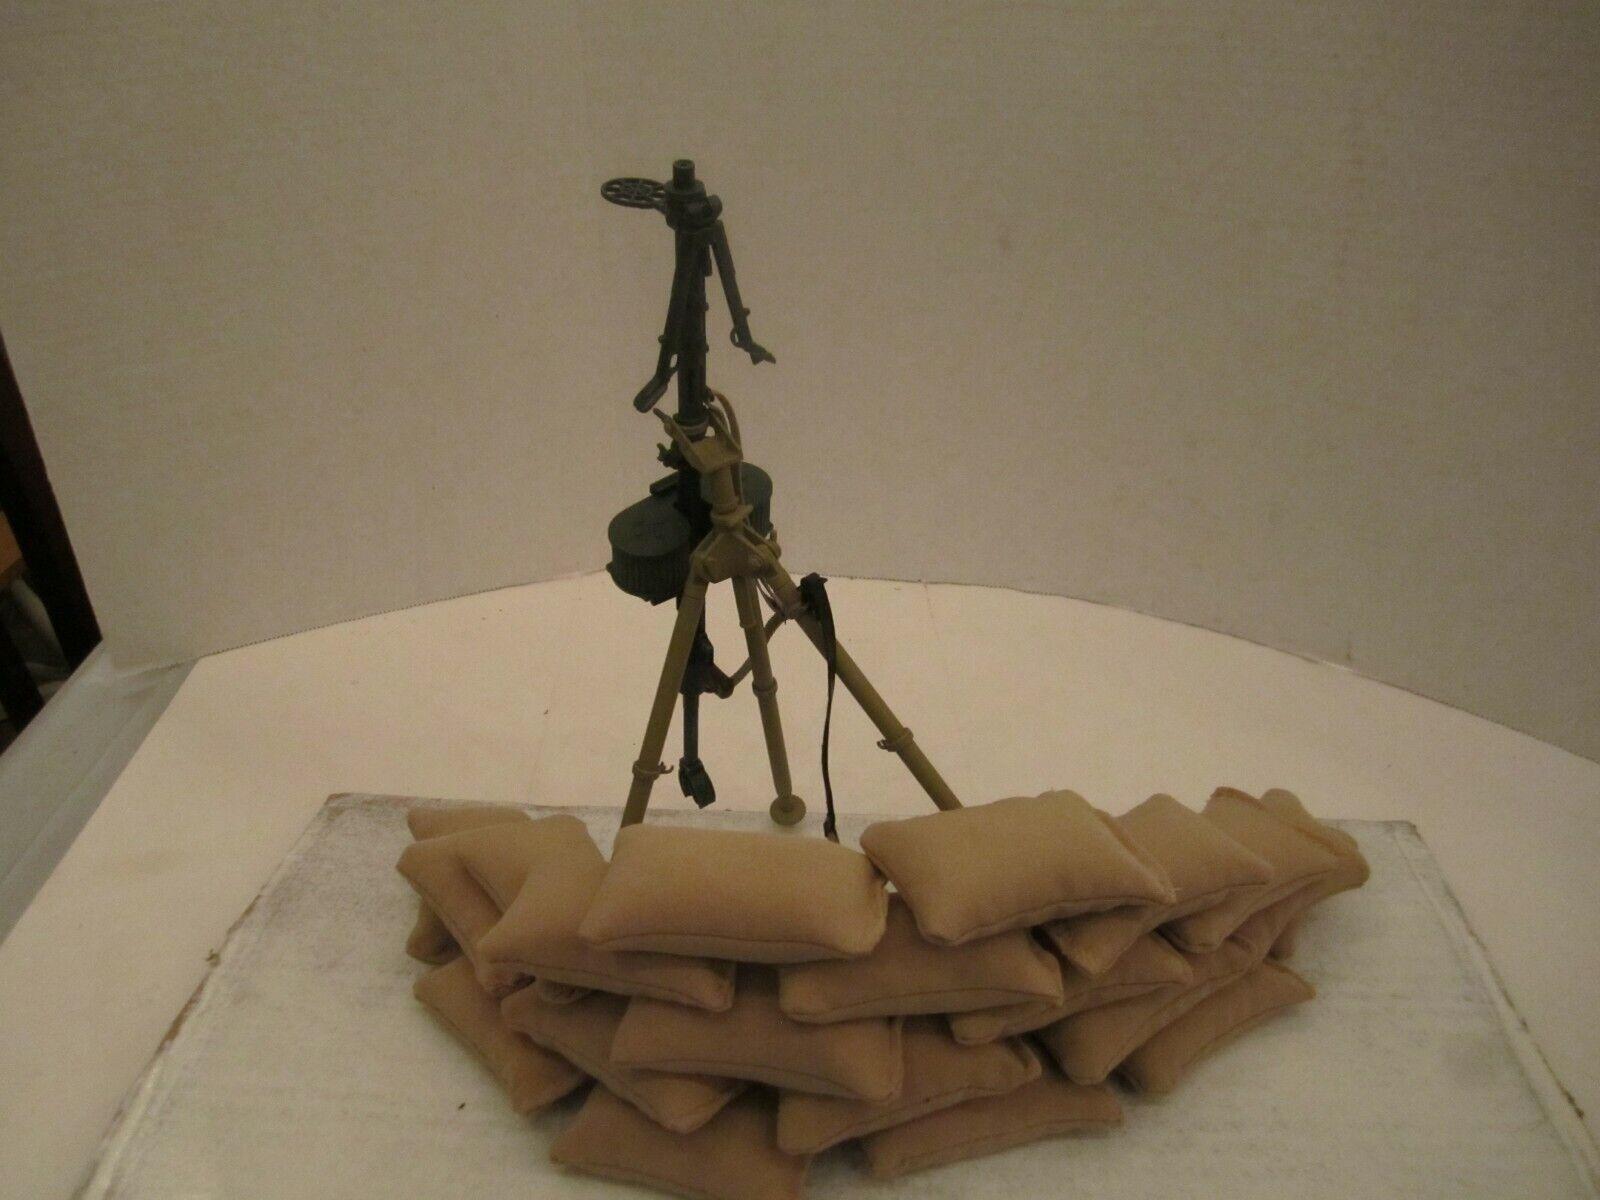 1 6 scale WW2 German MG 15 (metal legs) + 20 sandbags (micro bead filled)